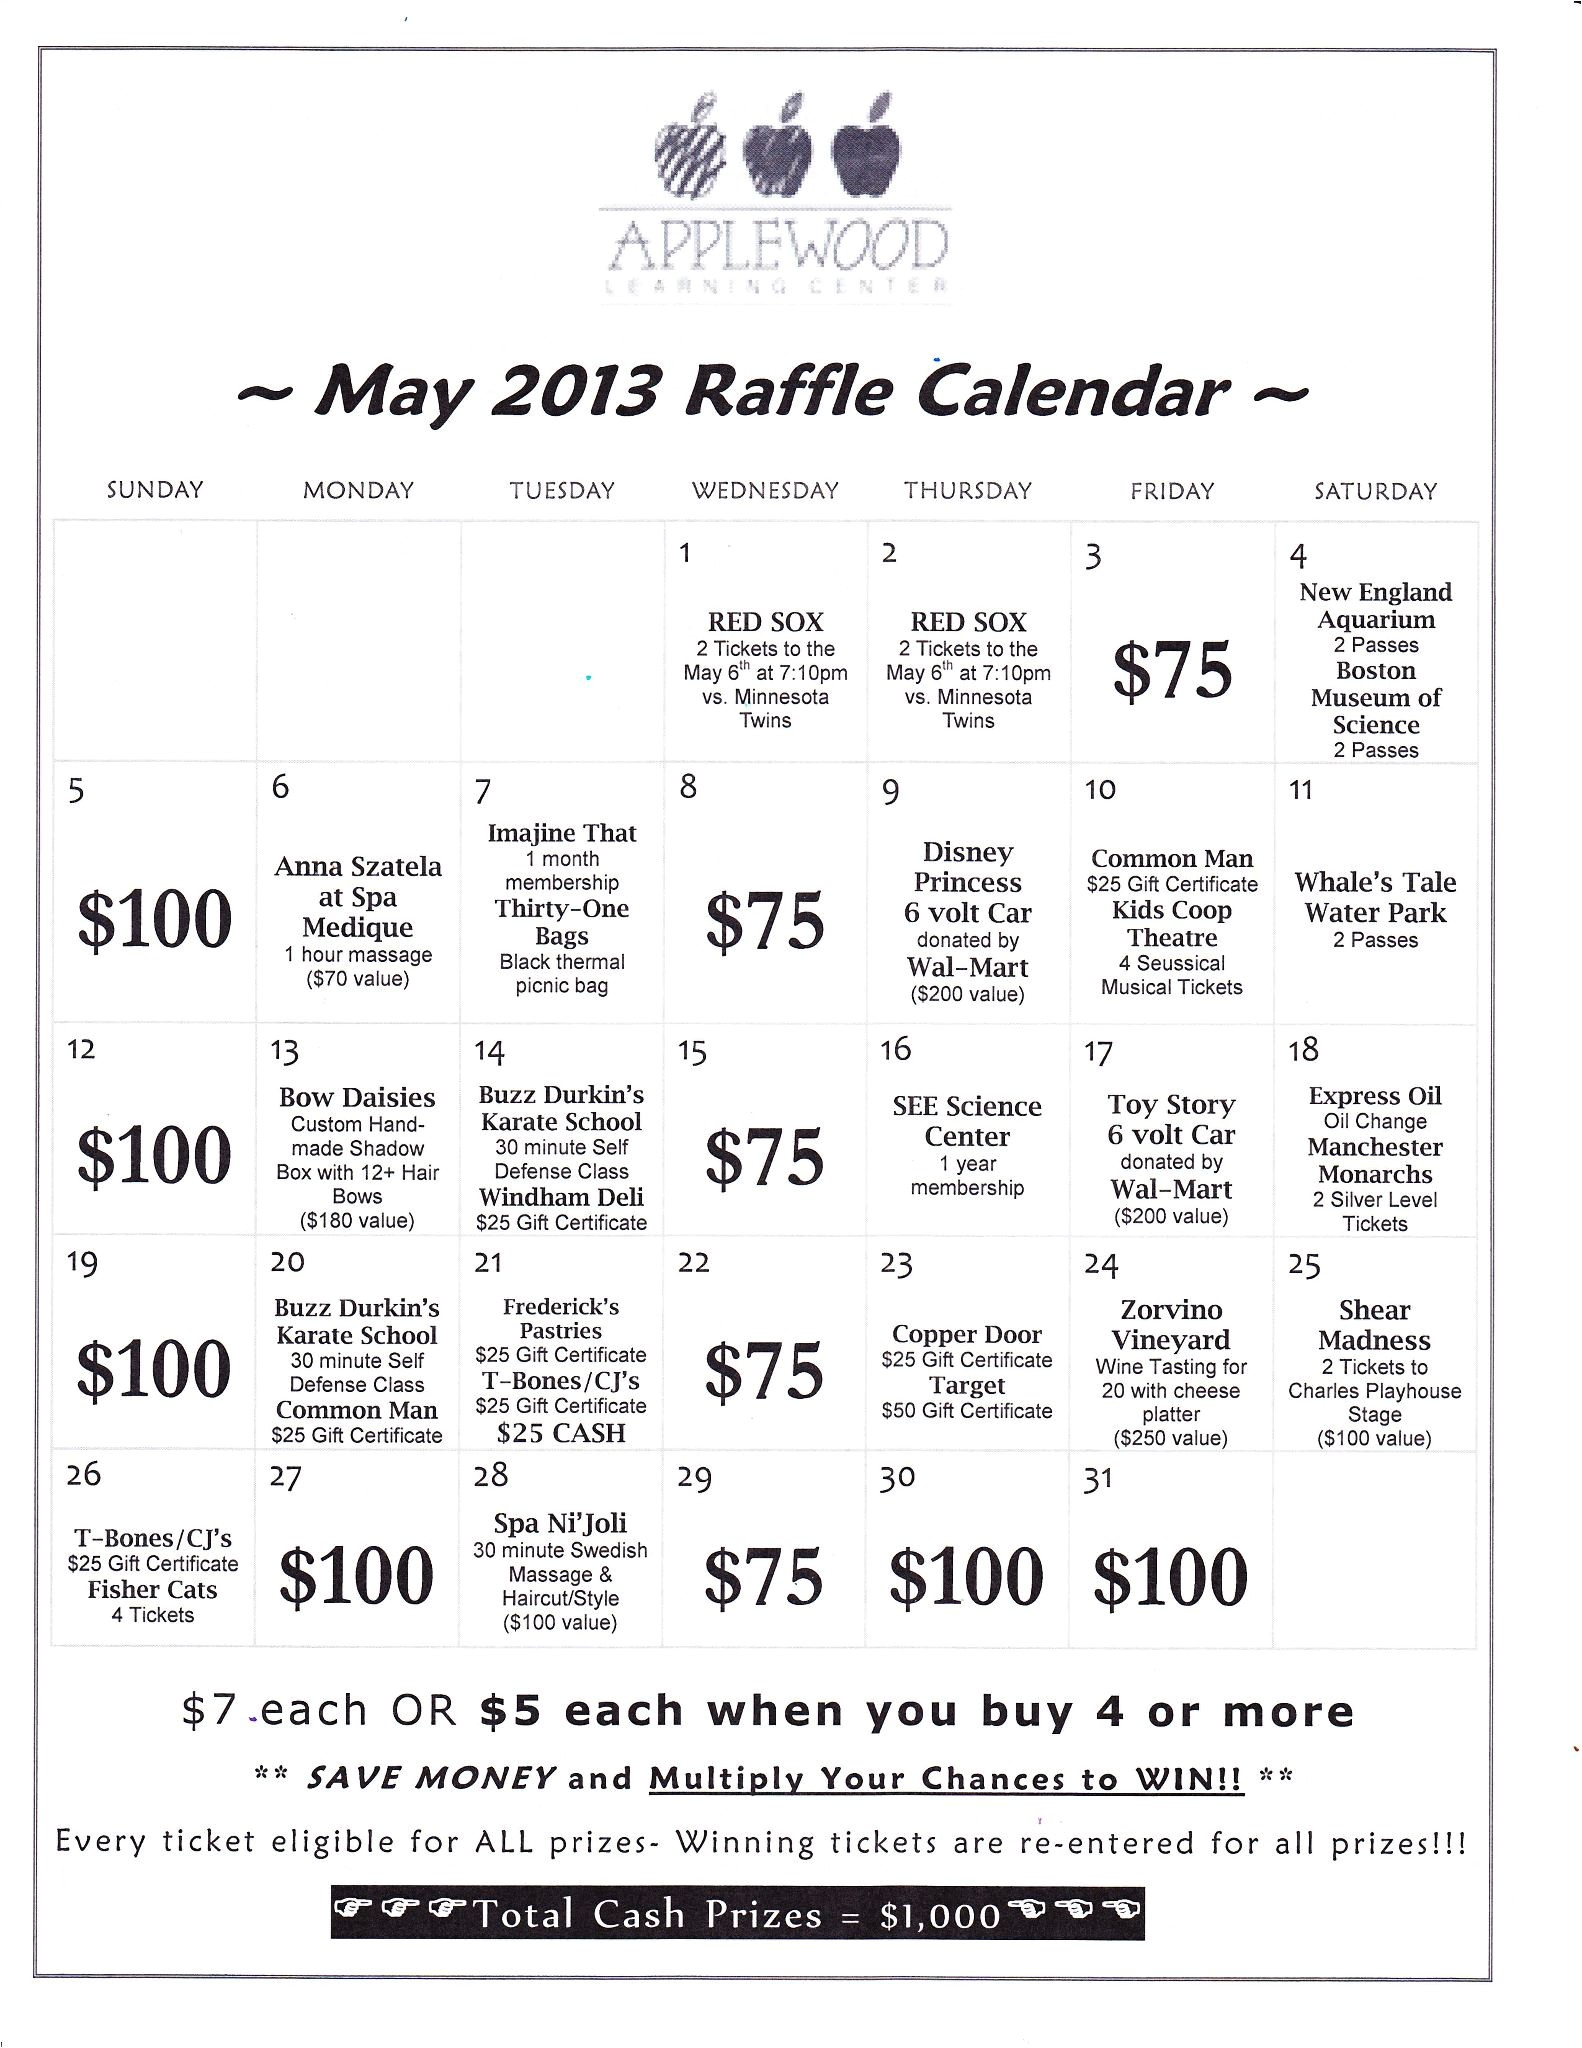 annual raffle calendar fundraiser